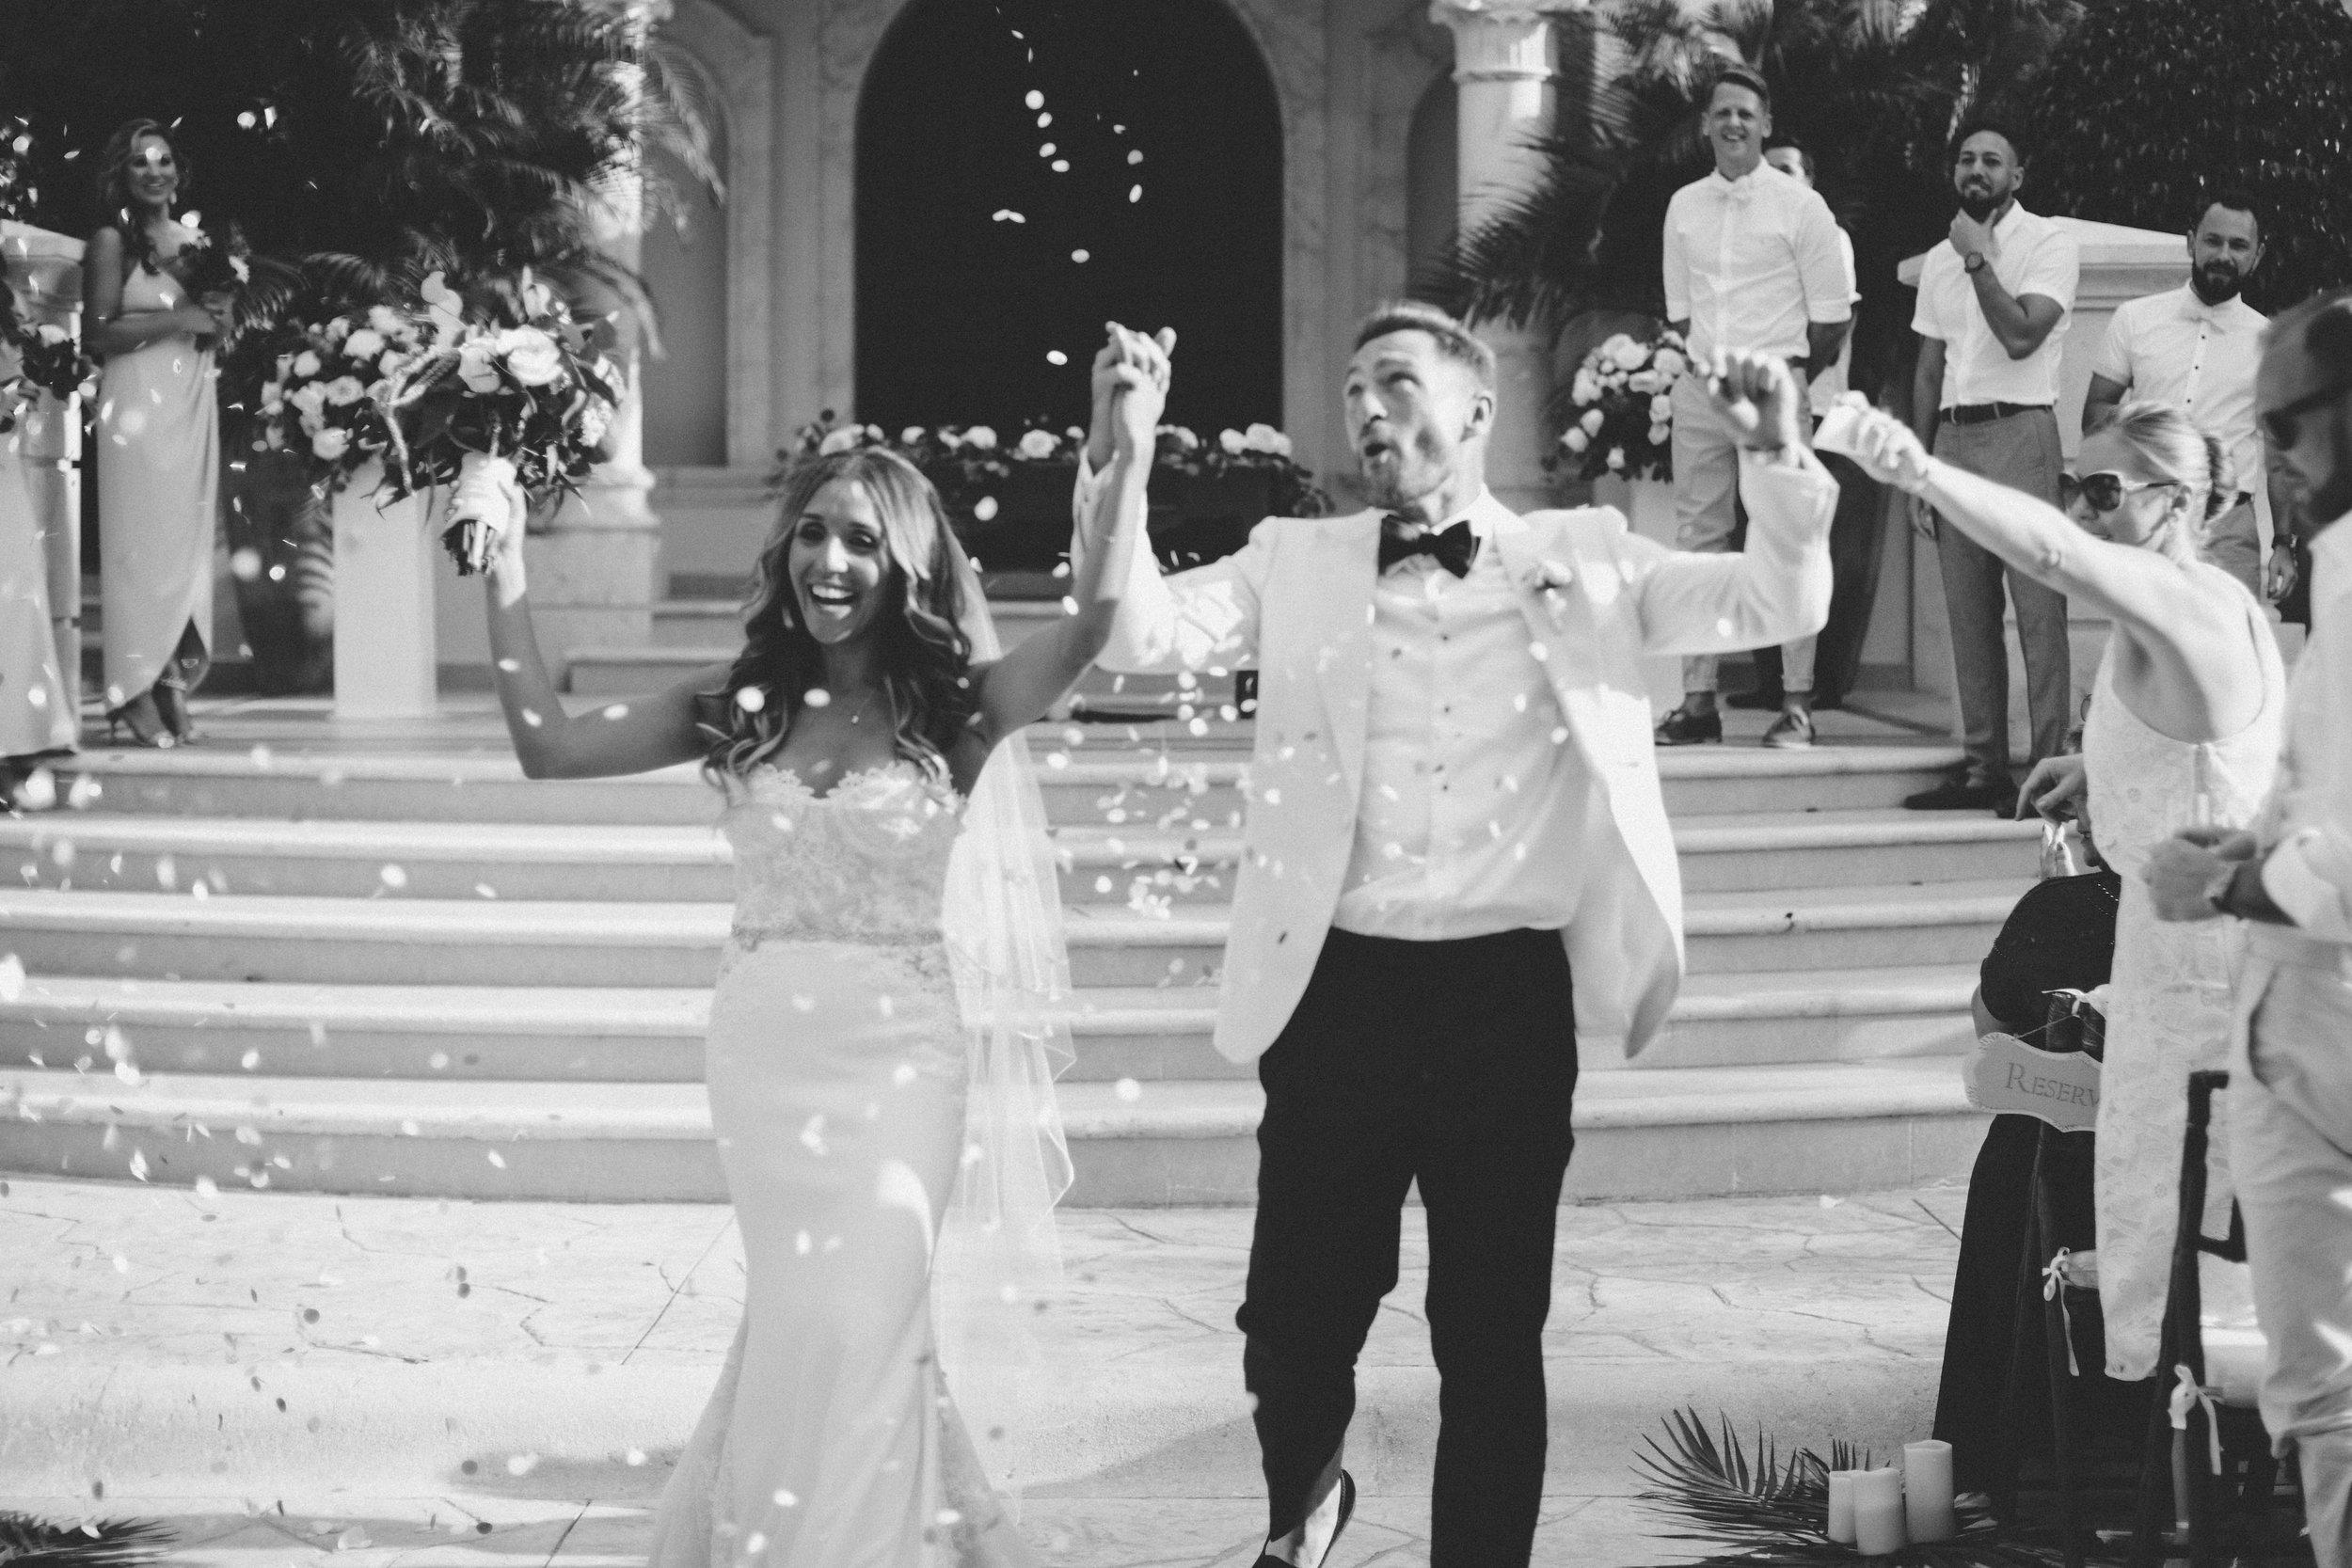 mexico_wedding_cancun_villa_la_joya_evangeline_lane_068.jpg